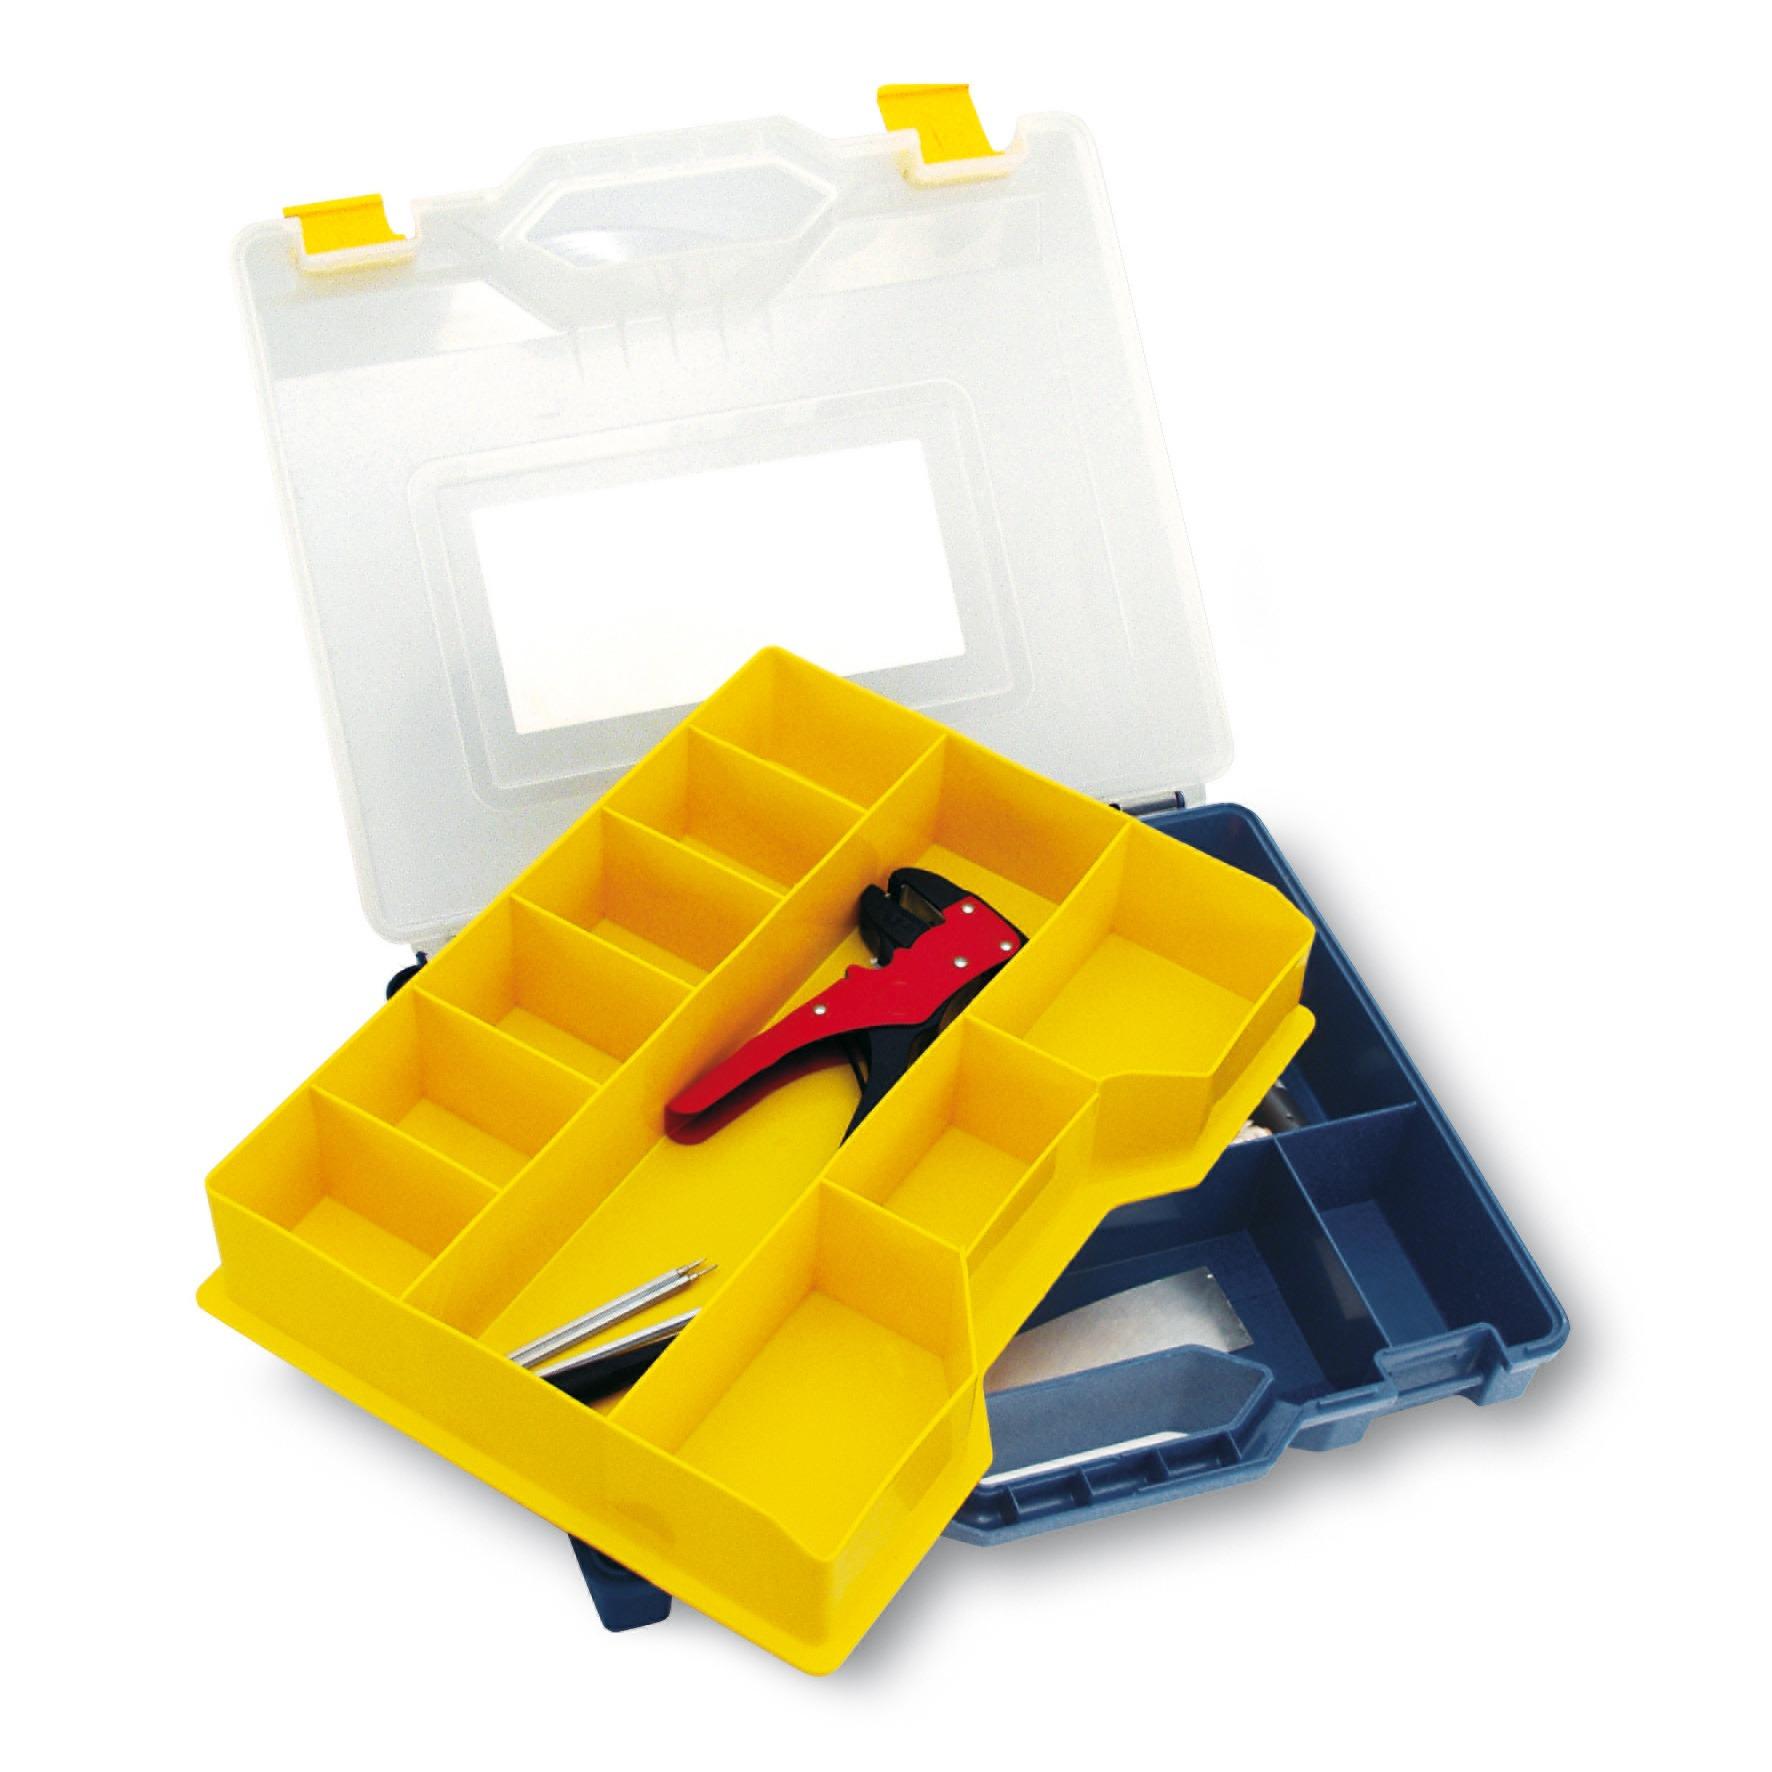 Maletas herramientas eléctricas mod. 42